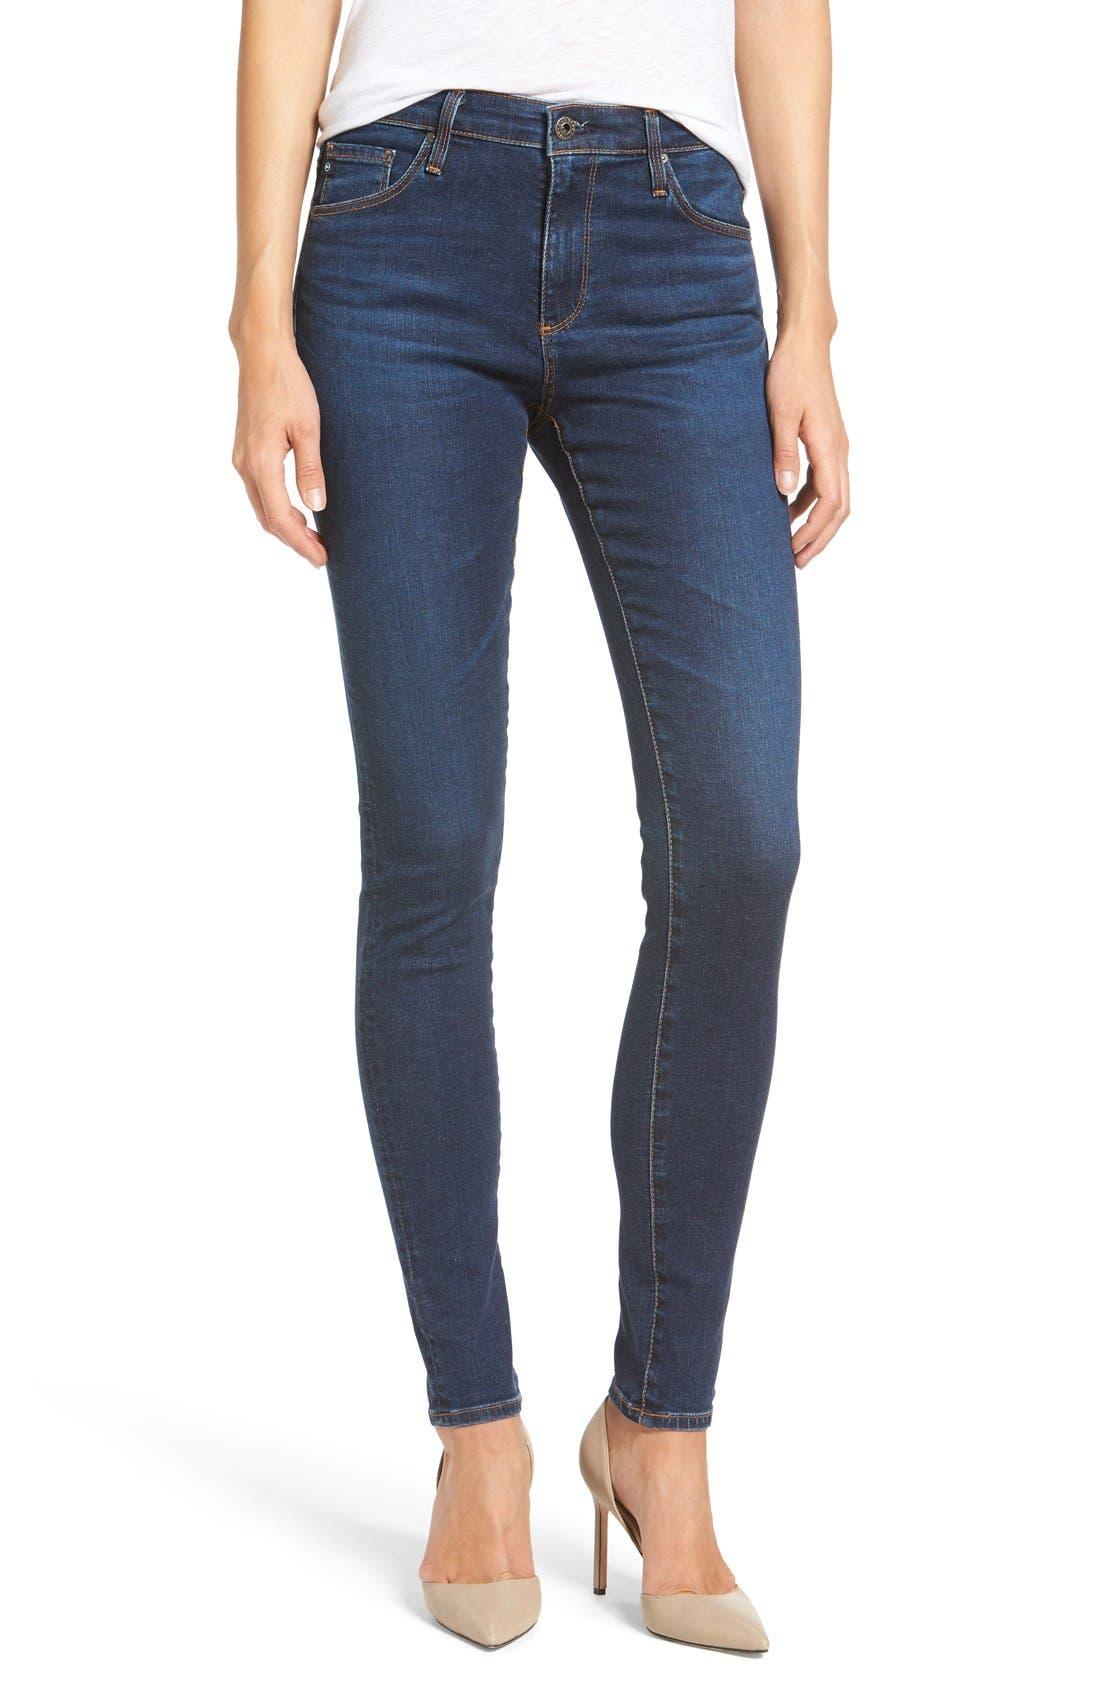 'The Farrah' High Rise Skinny Jeans,                             Main thumbnail 10, color,